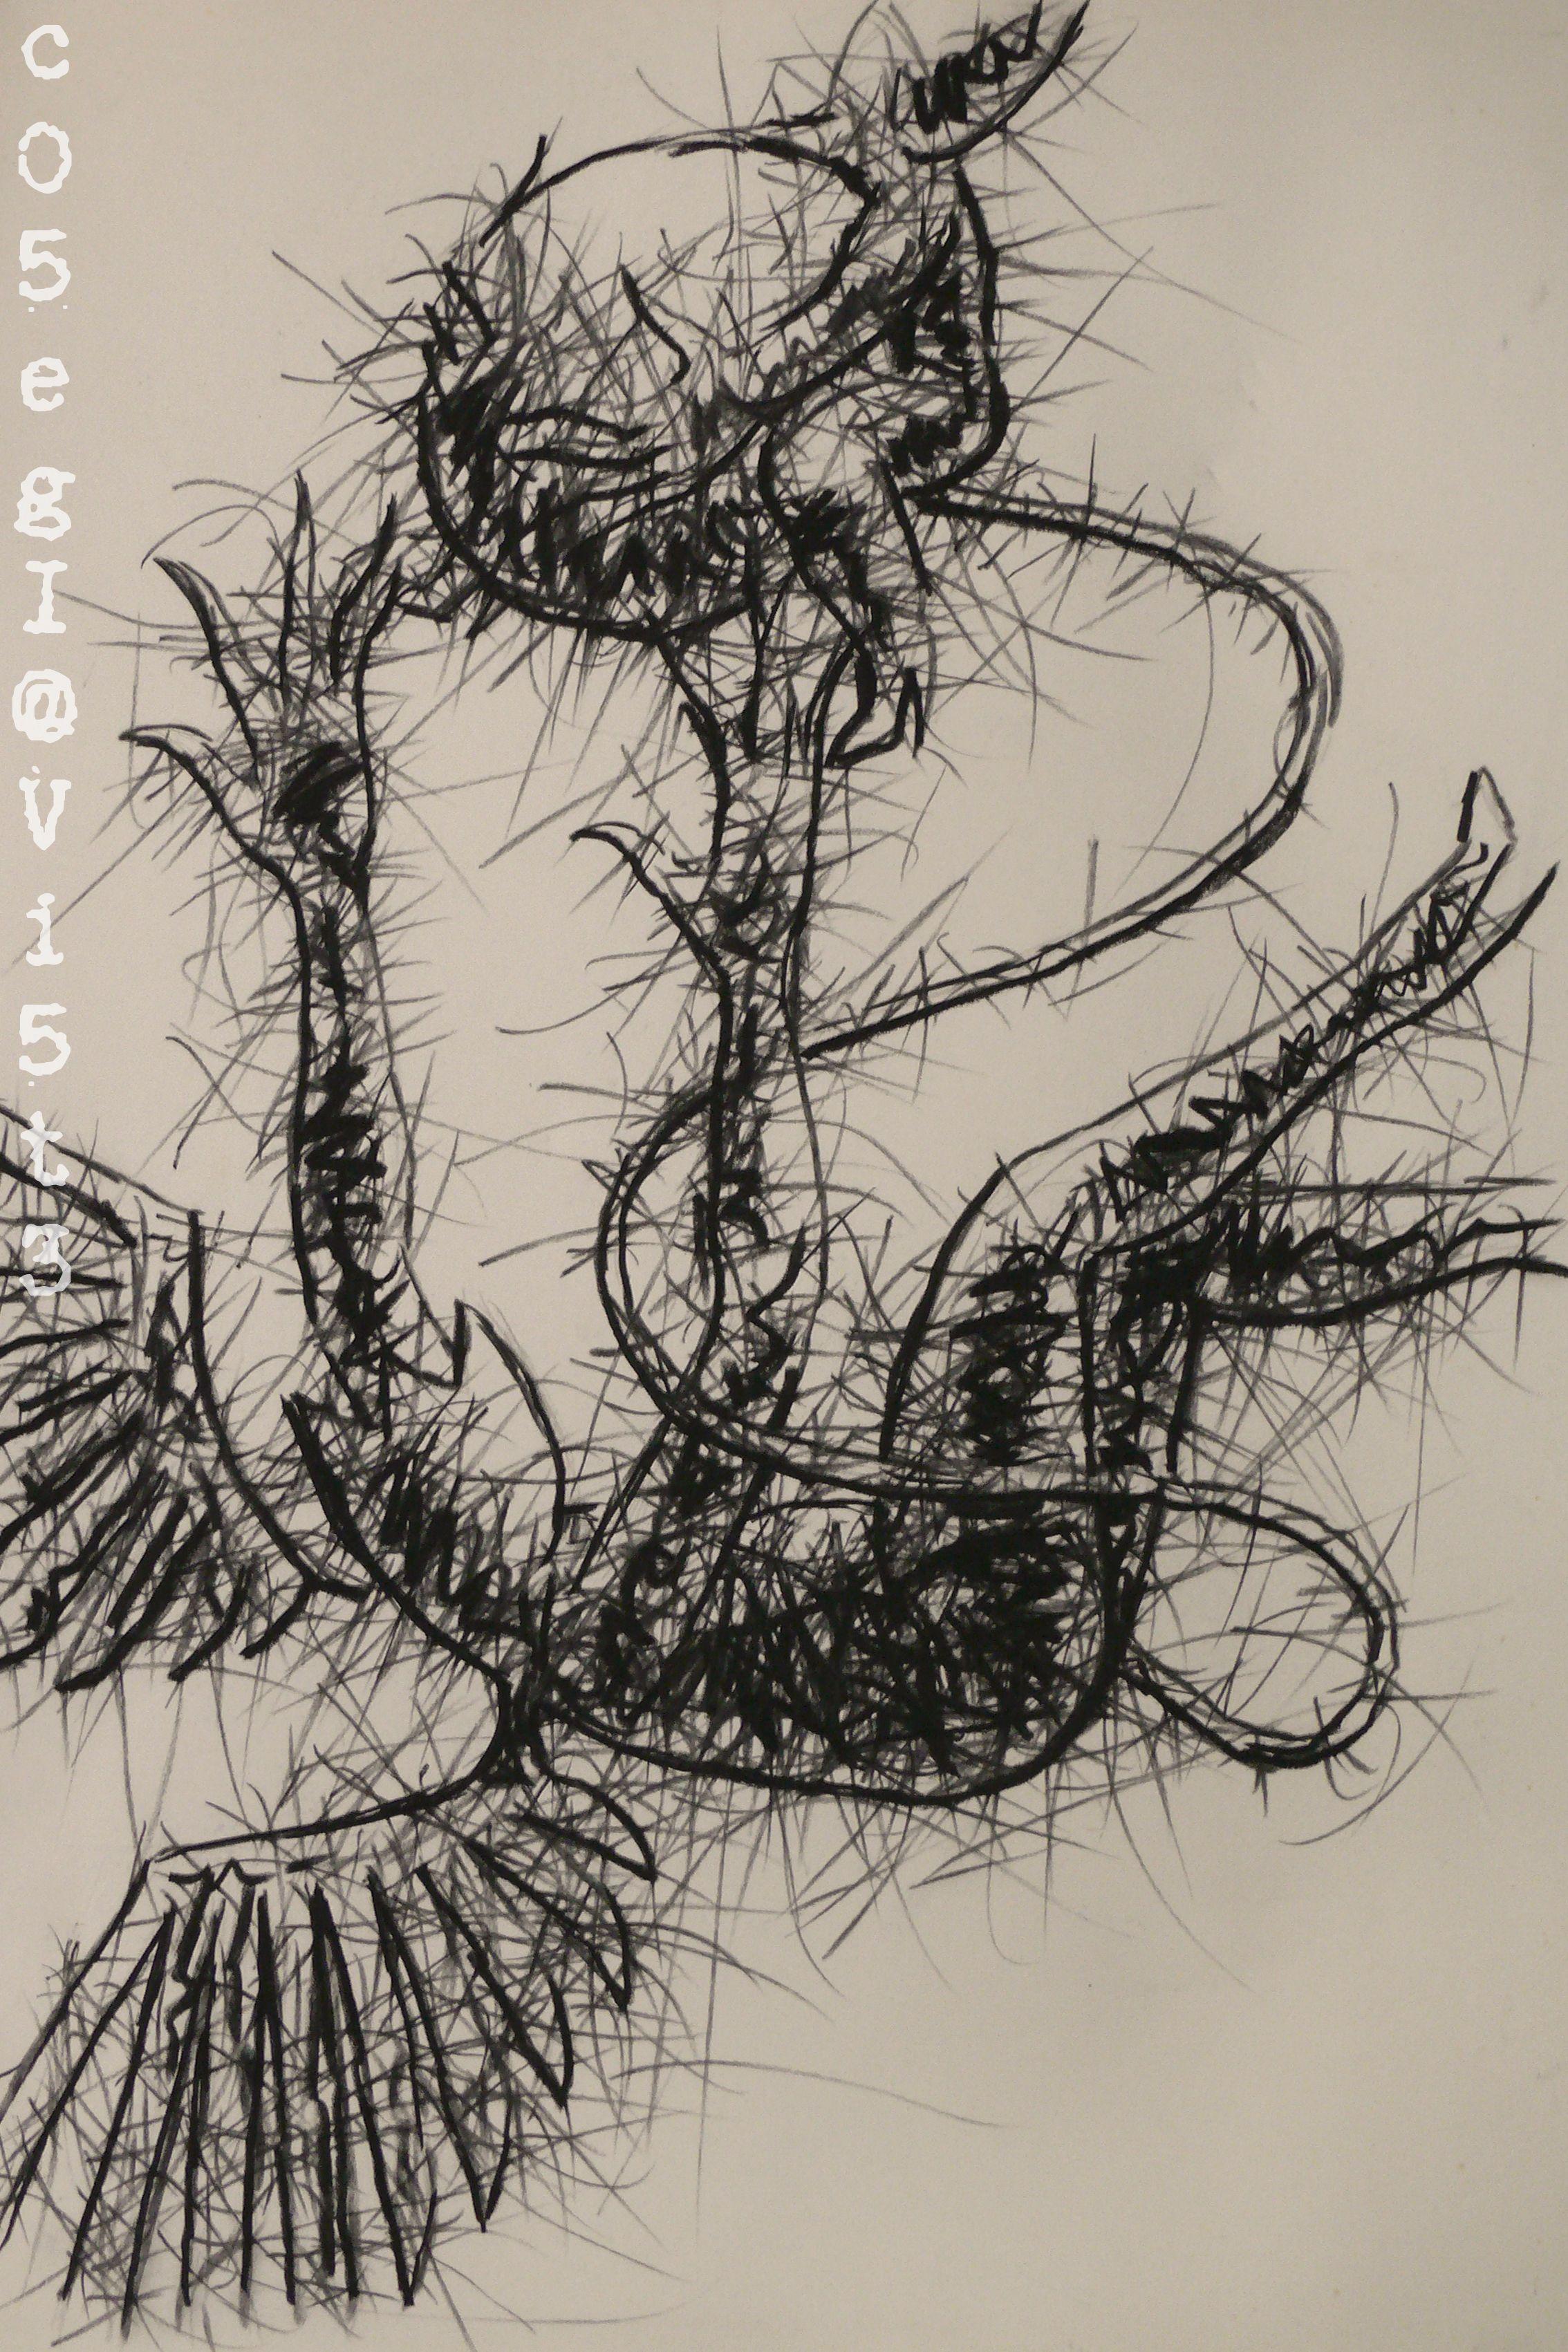 …dirty sketches for photographs and paintings project… NO TITLE - 1996 (charcoal, sanguine and gypsum on cardboard) www.facebook.comcosegiaviste  #art #contemporaryart #visualart #painting #artcontemporain #artgallery #artecontemporanea #artgallery #artcollectors #cosegiaviste #danilosini